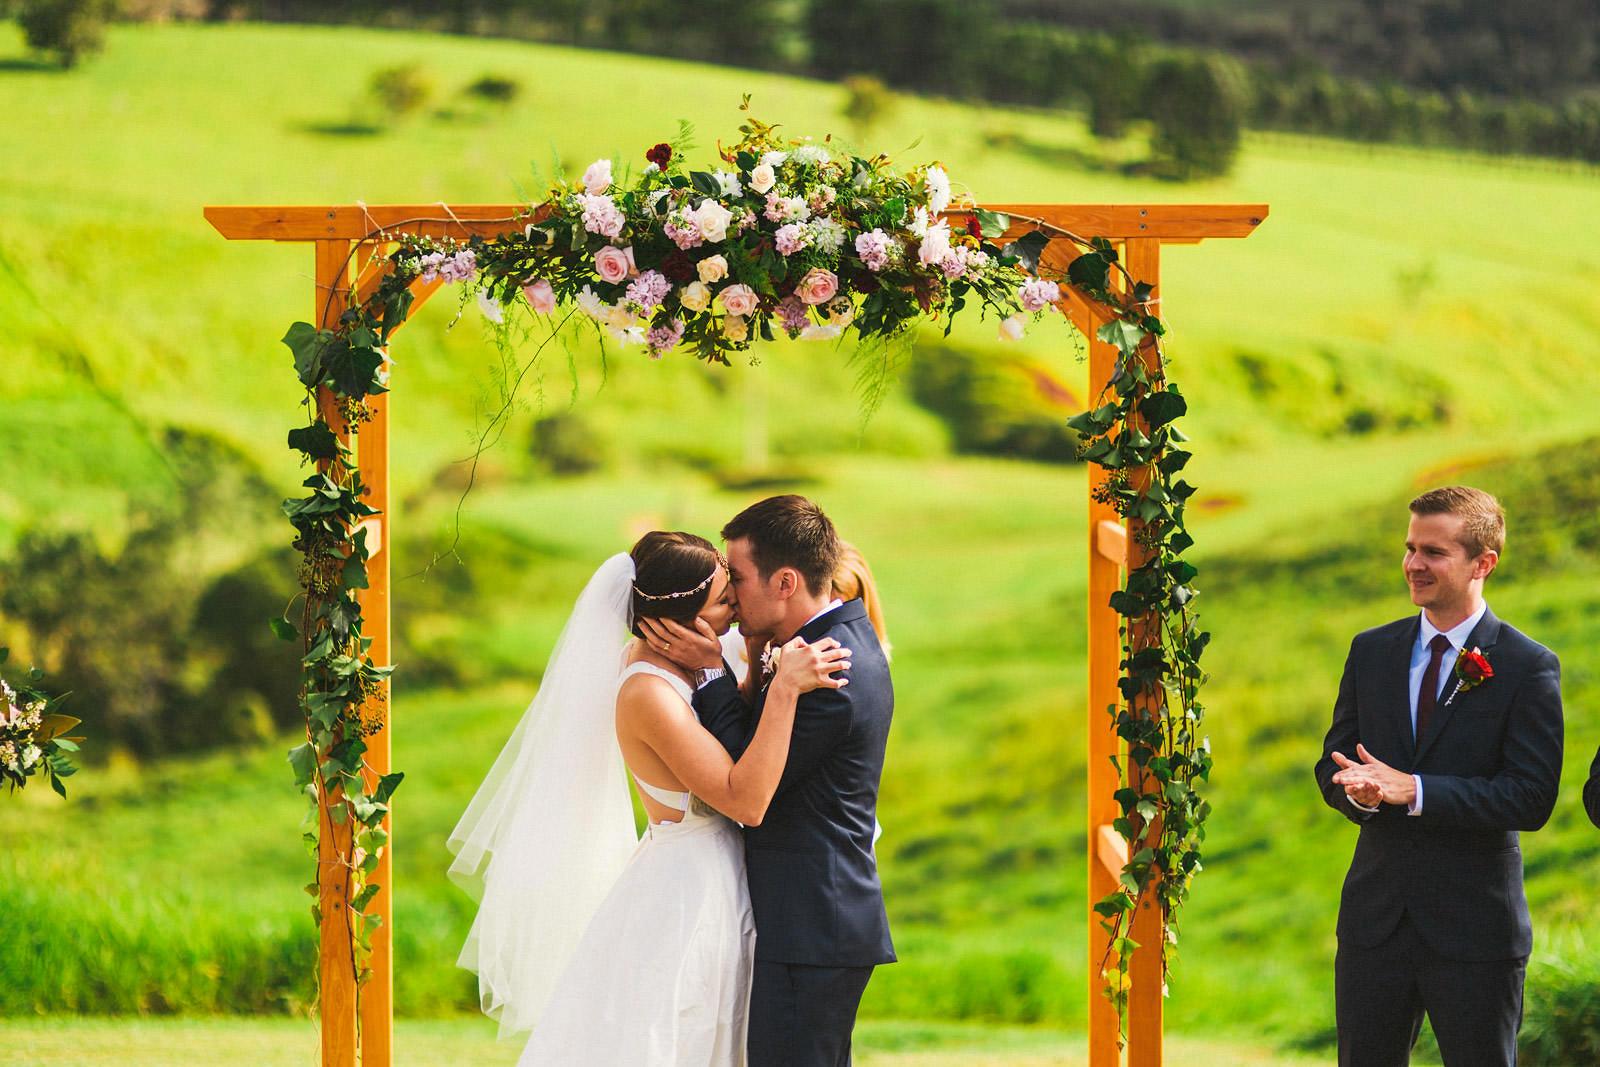 tablelands_wedding_0021